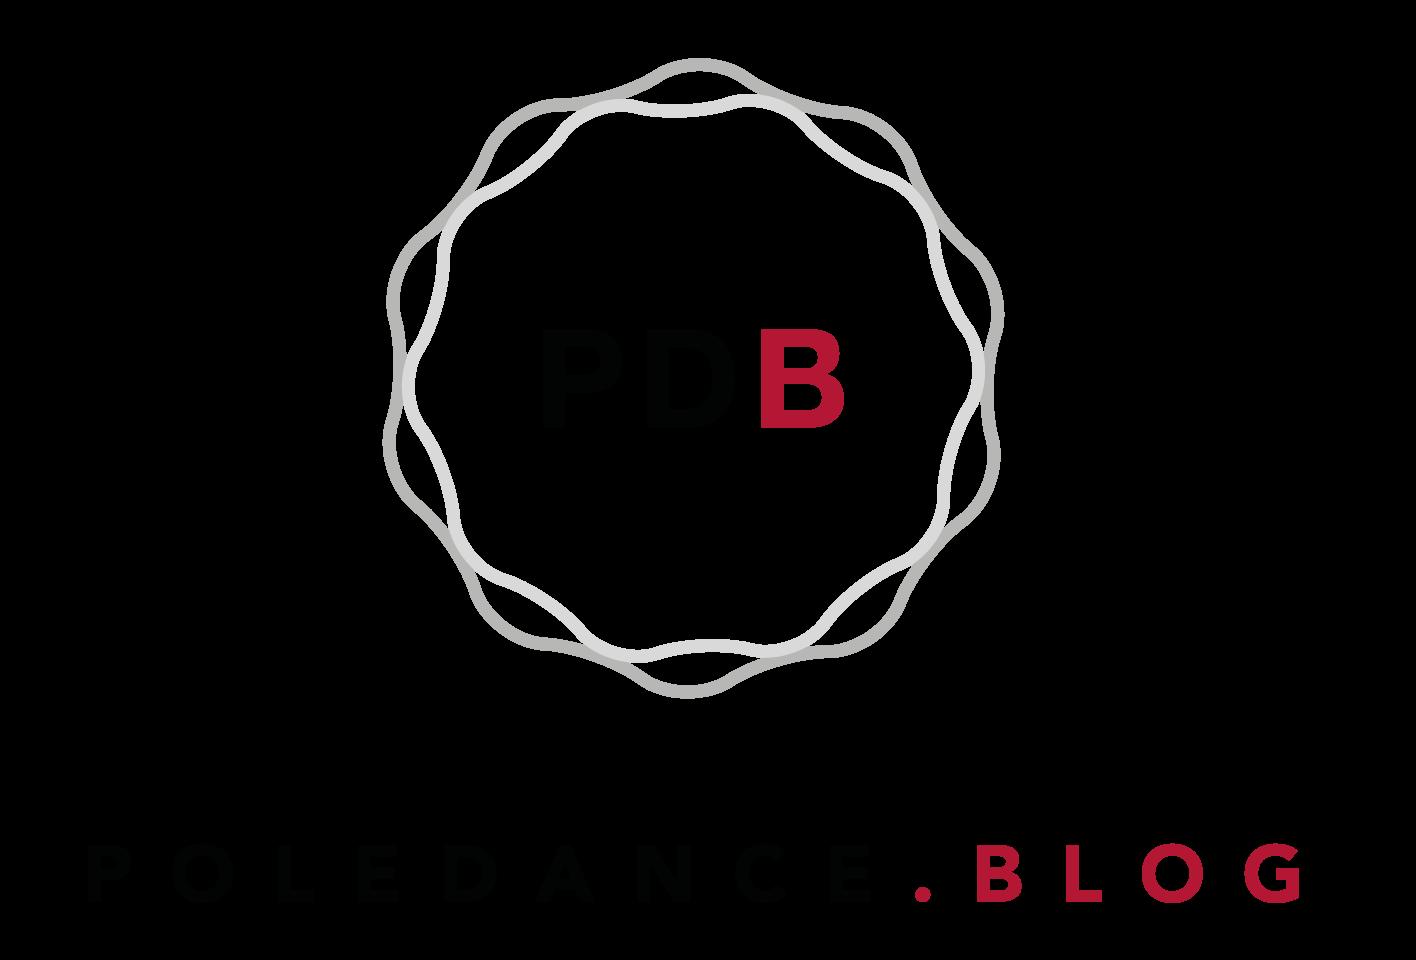 Poledance Blog